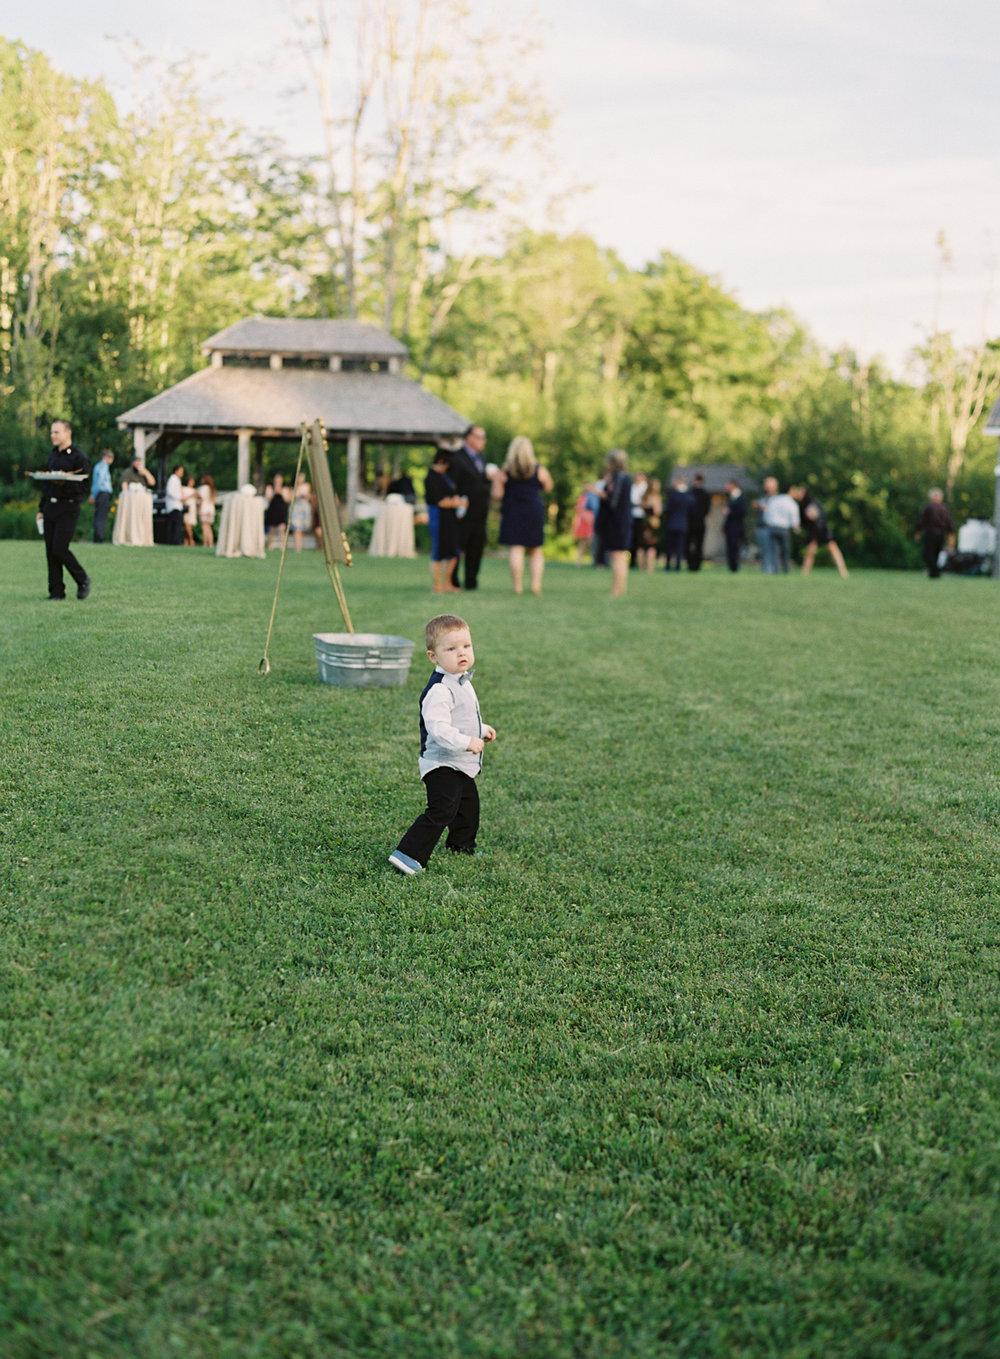 Jacqueline Anne Photography - Nova Scotia Backyard Wedding-80.jpg